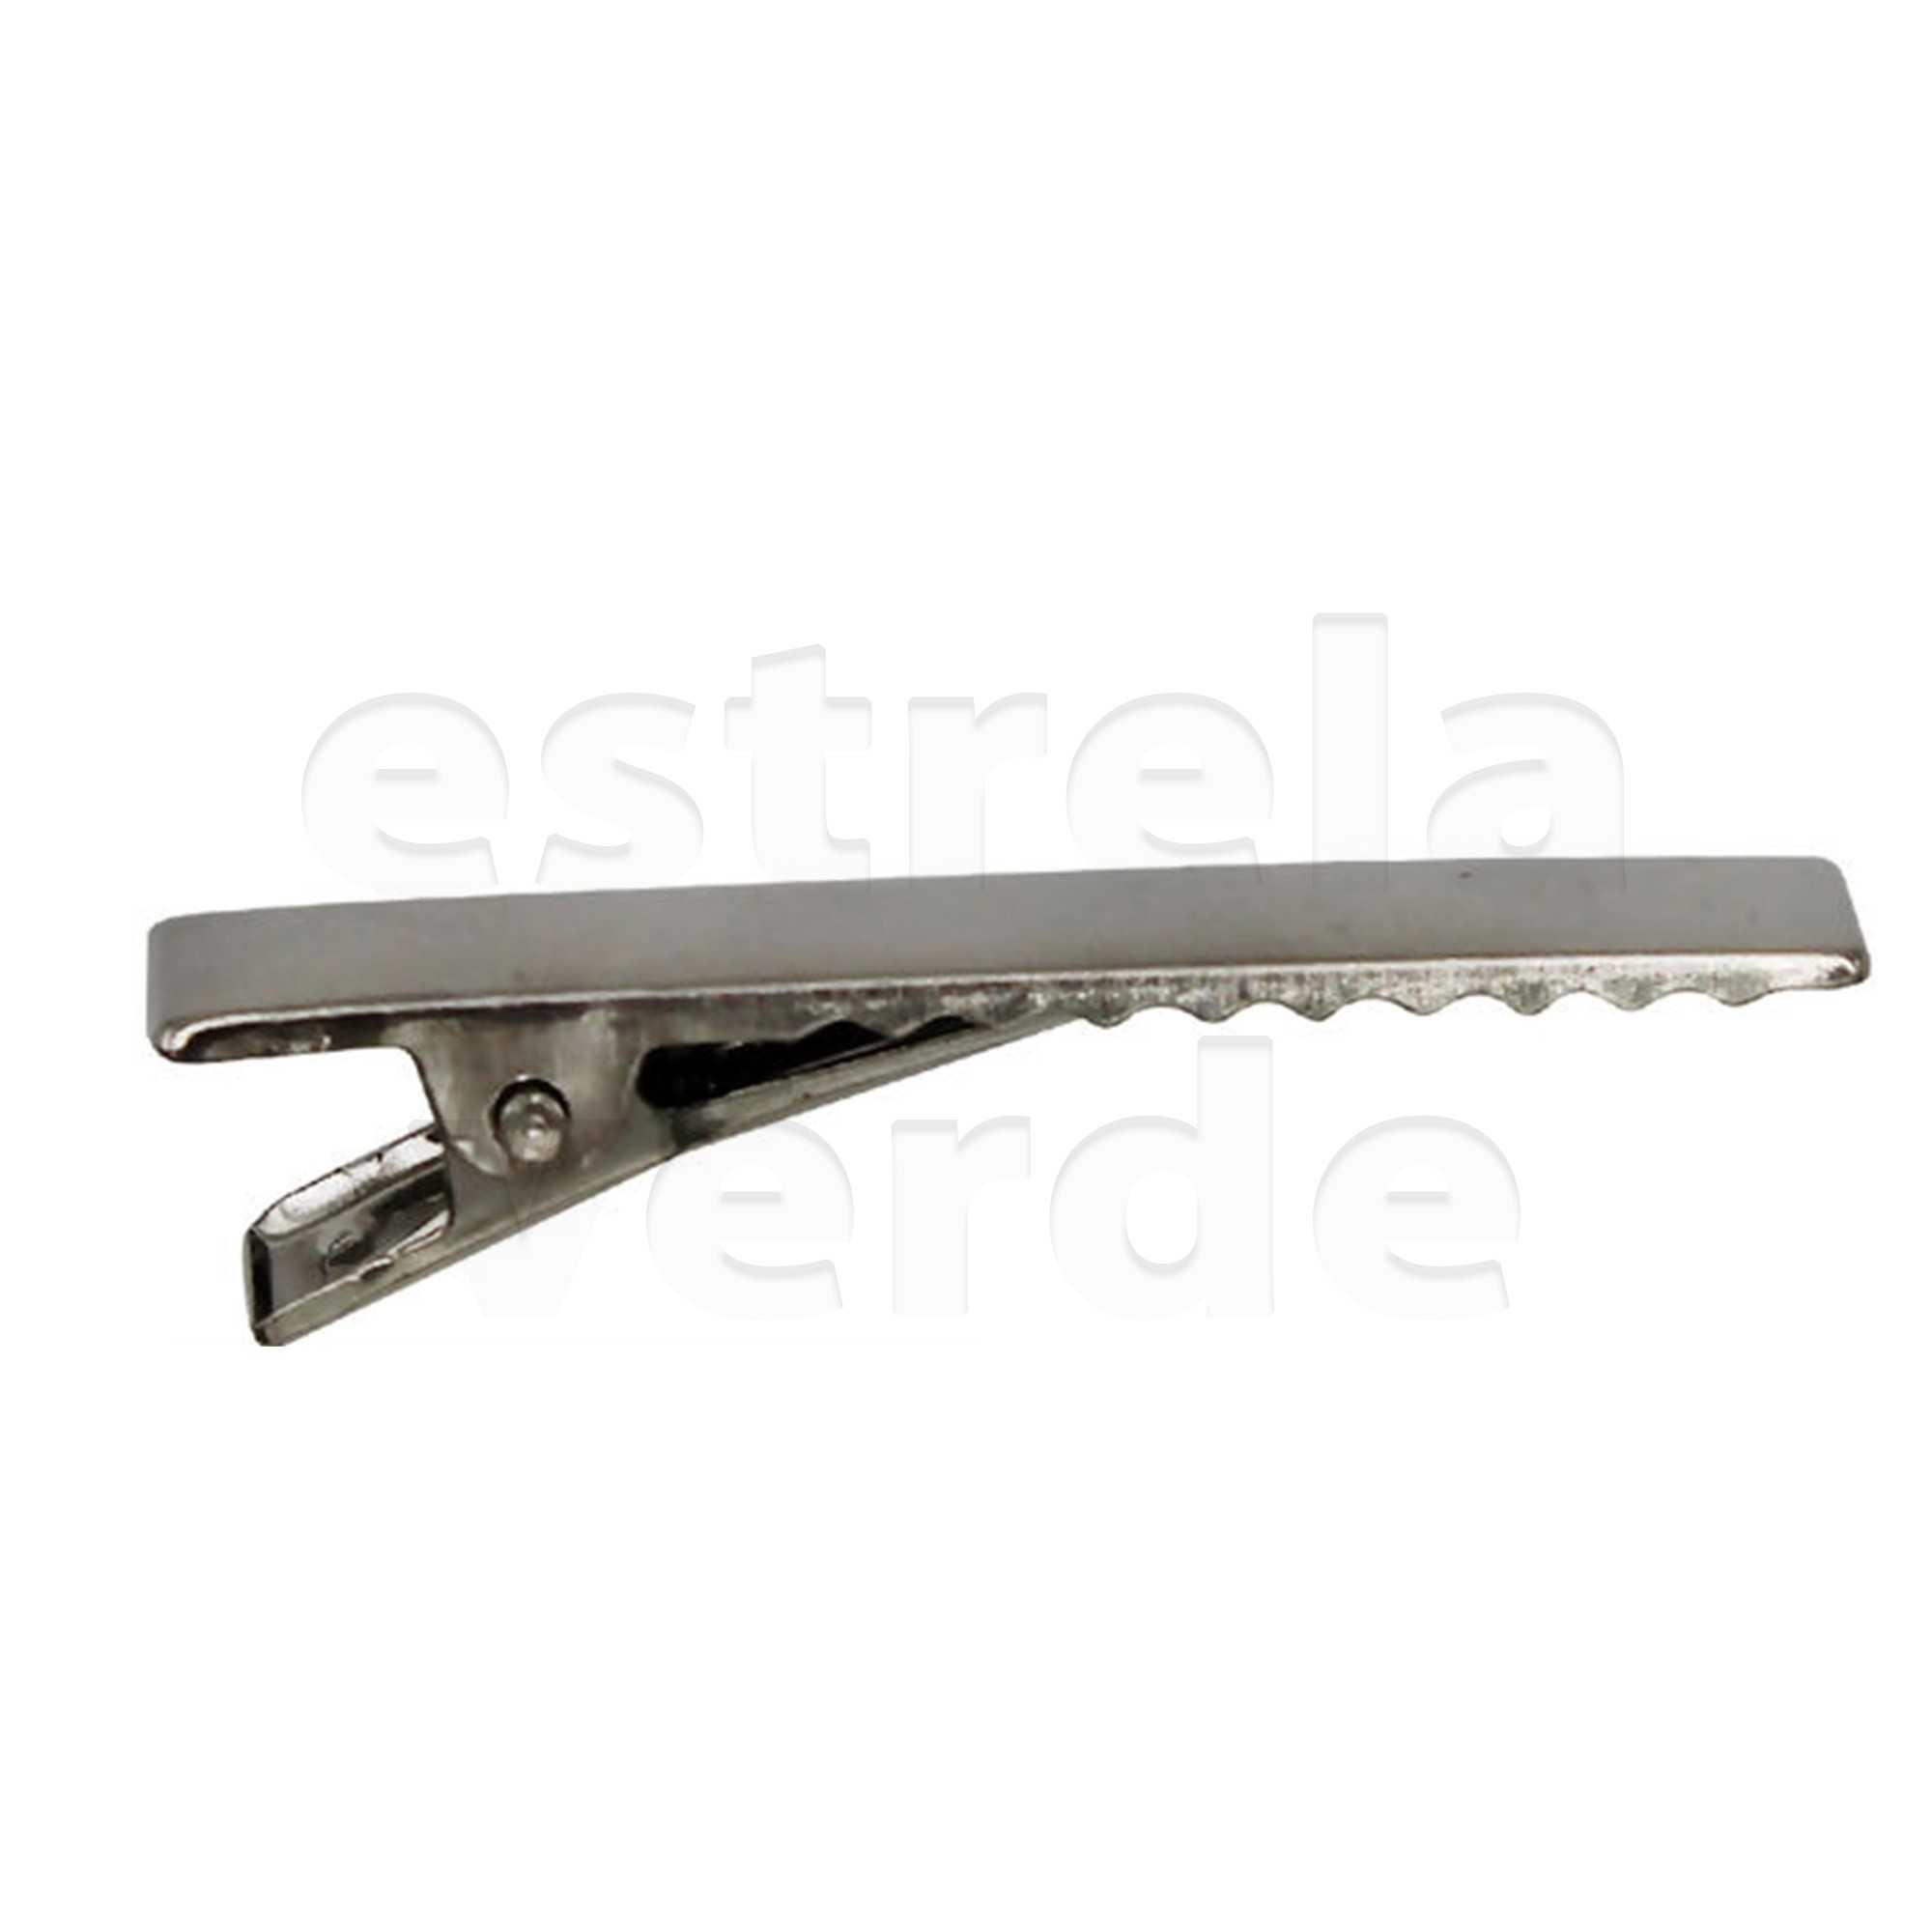 PRESILHA JACARE 32MM RO115116 C/100UN NIQUEL  - Estrela Verde